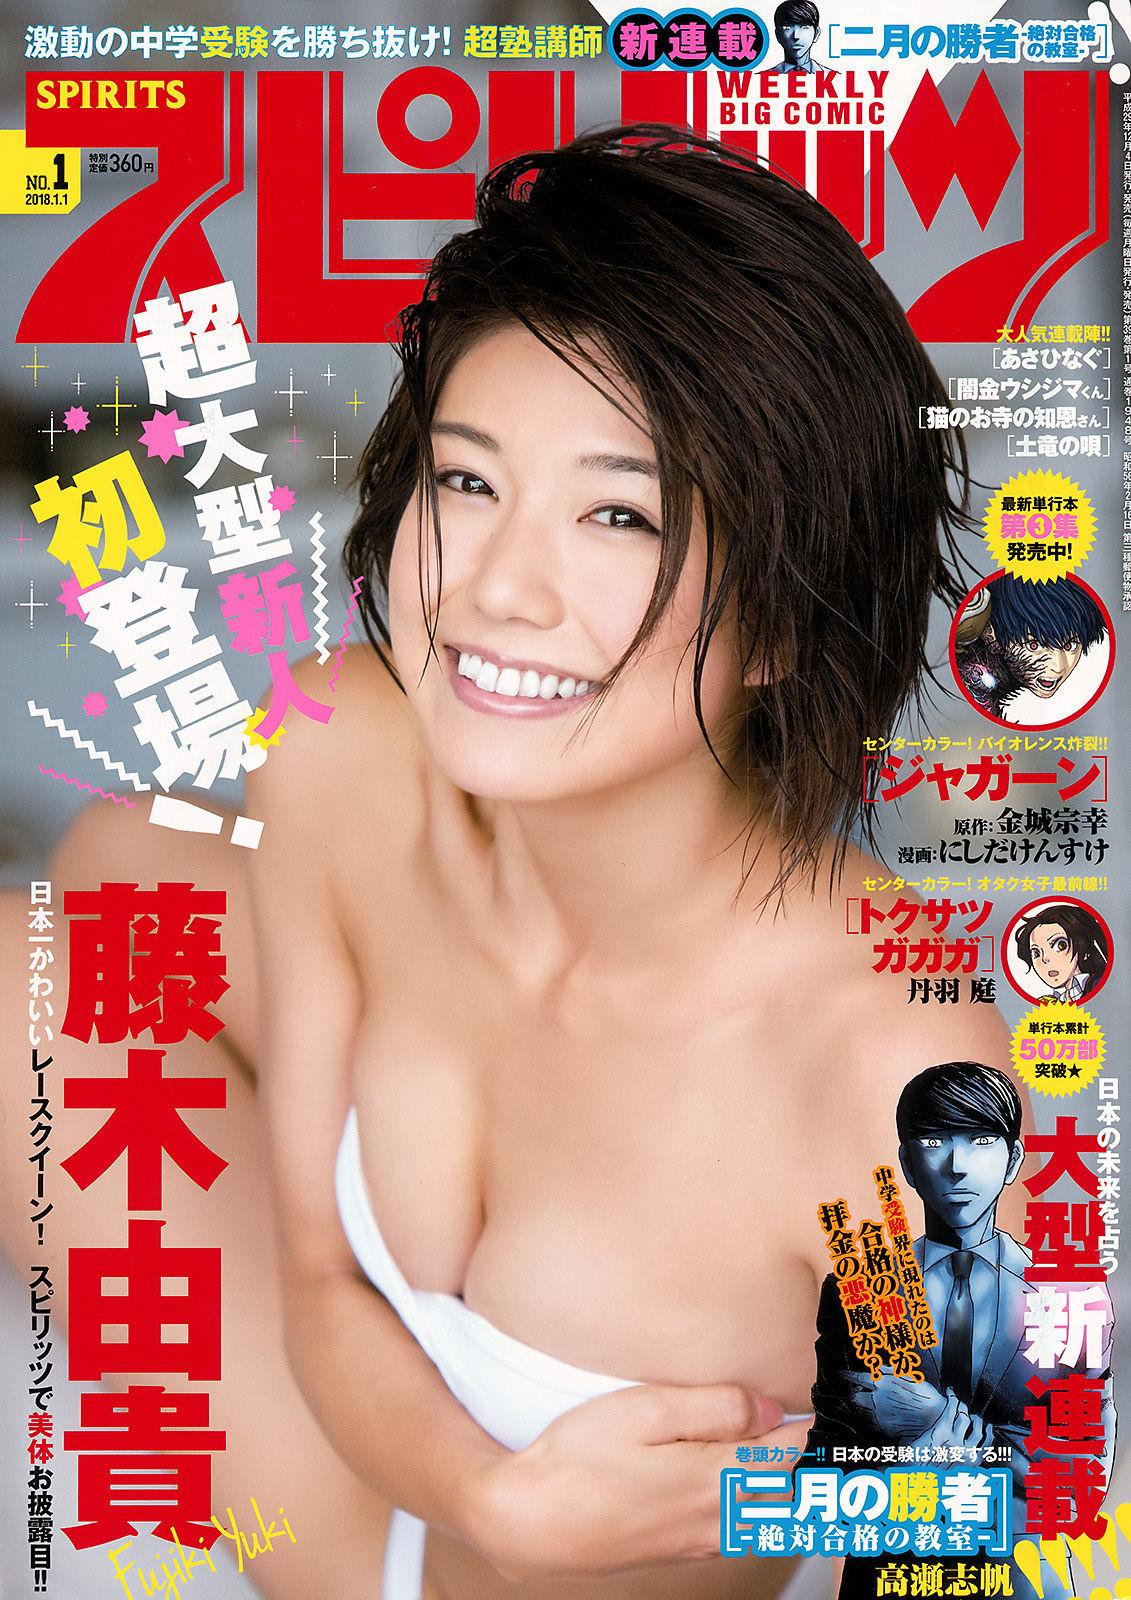 [Weekly Big Comic Spirits杂志写真]藤木由贵(藤木由貴)超高清写真大图片(7P)|30热度